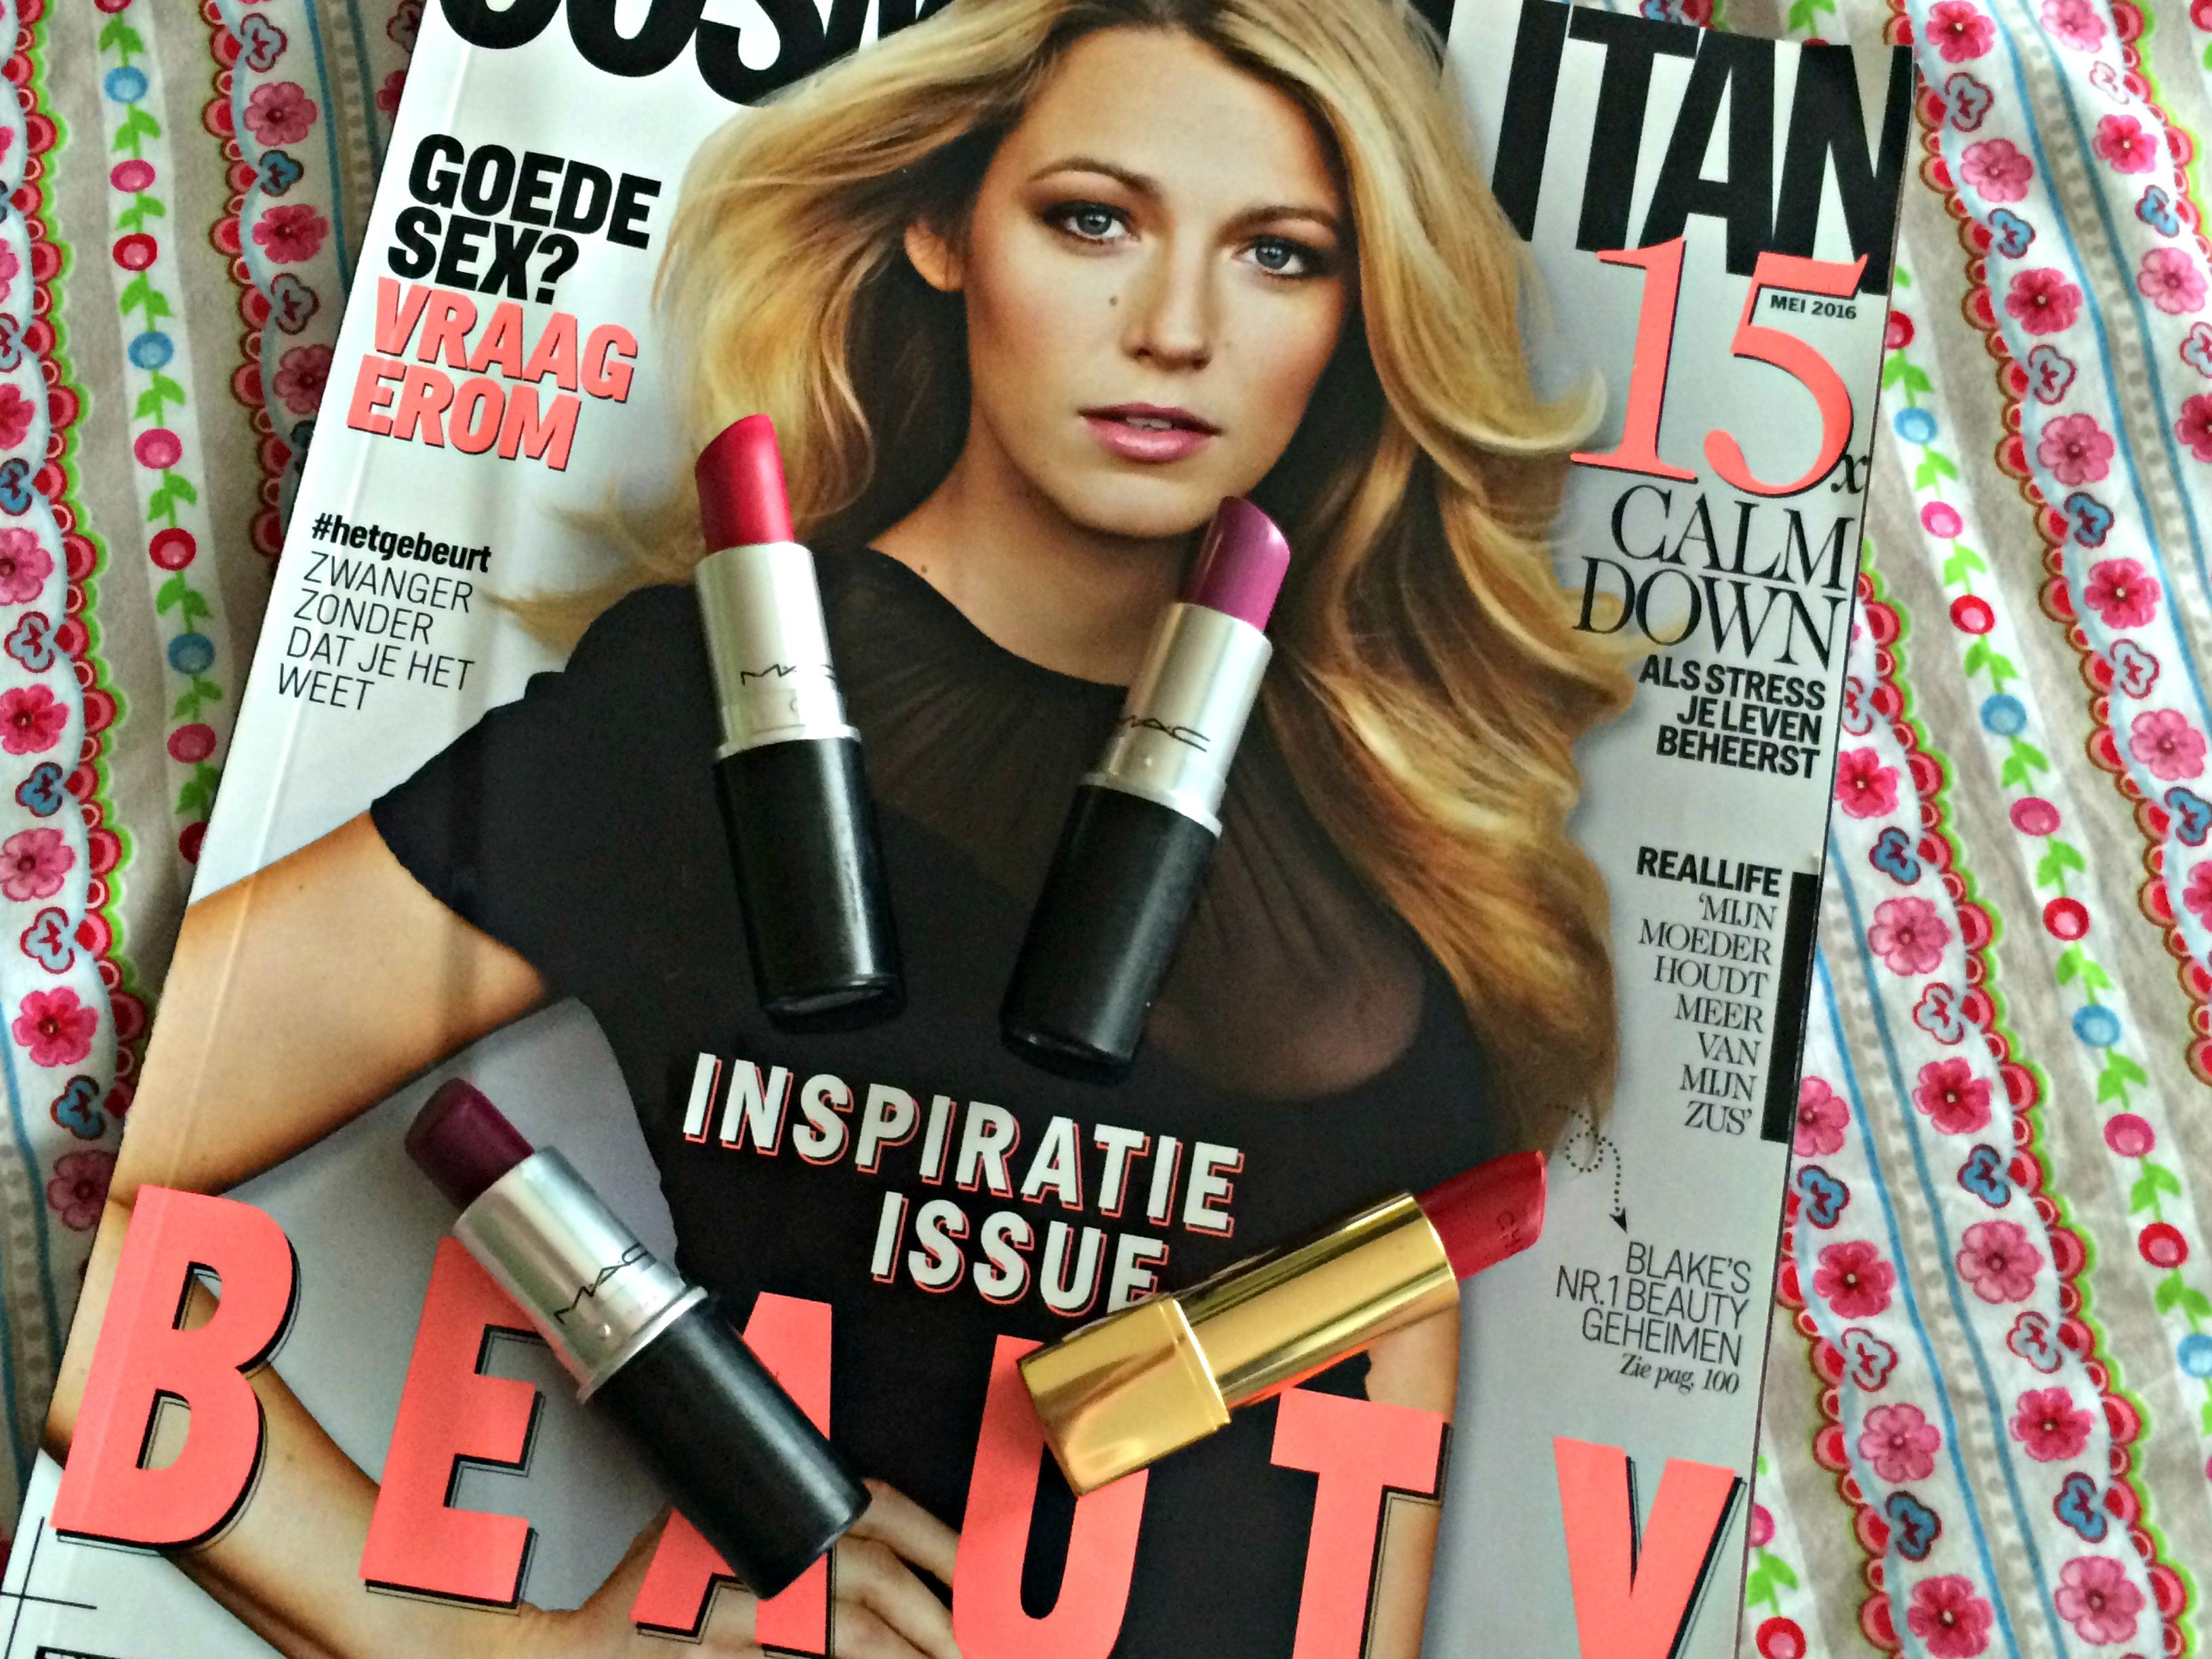 favoriete lipsticks 2